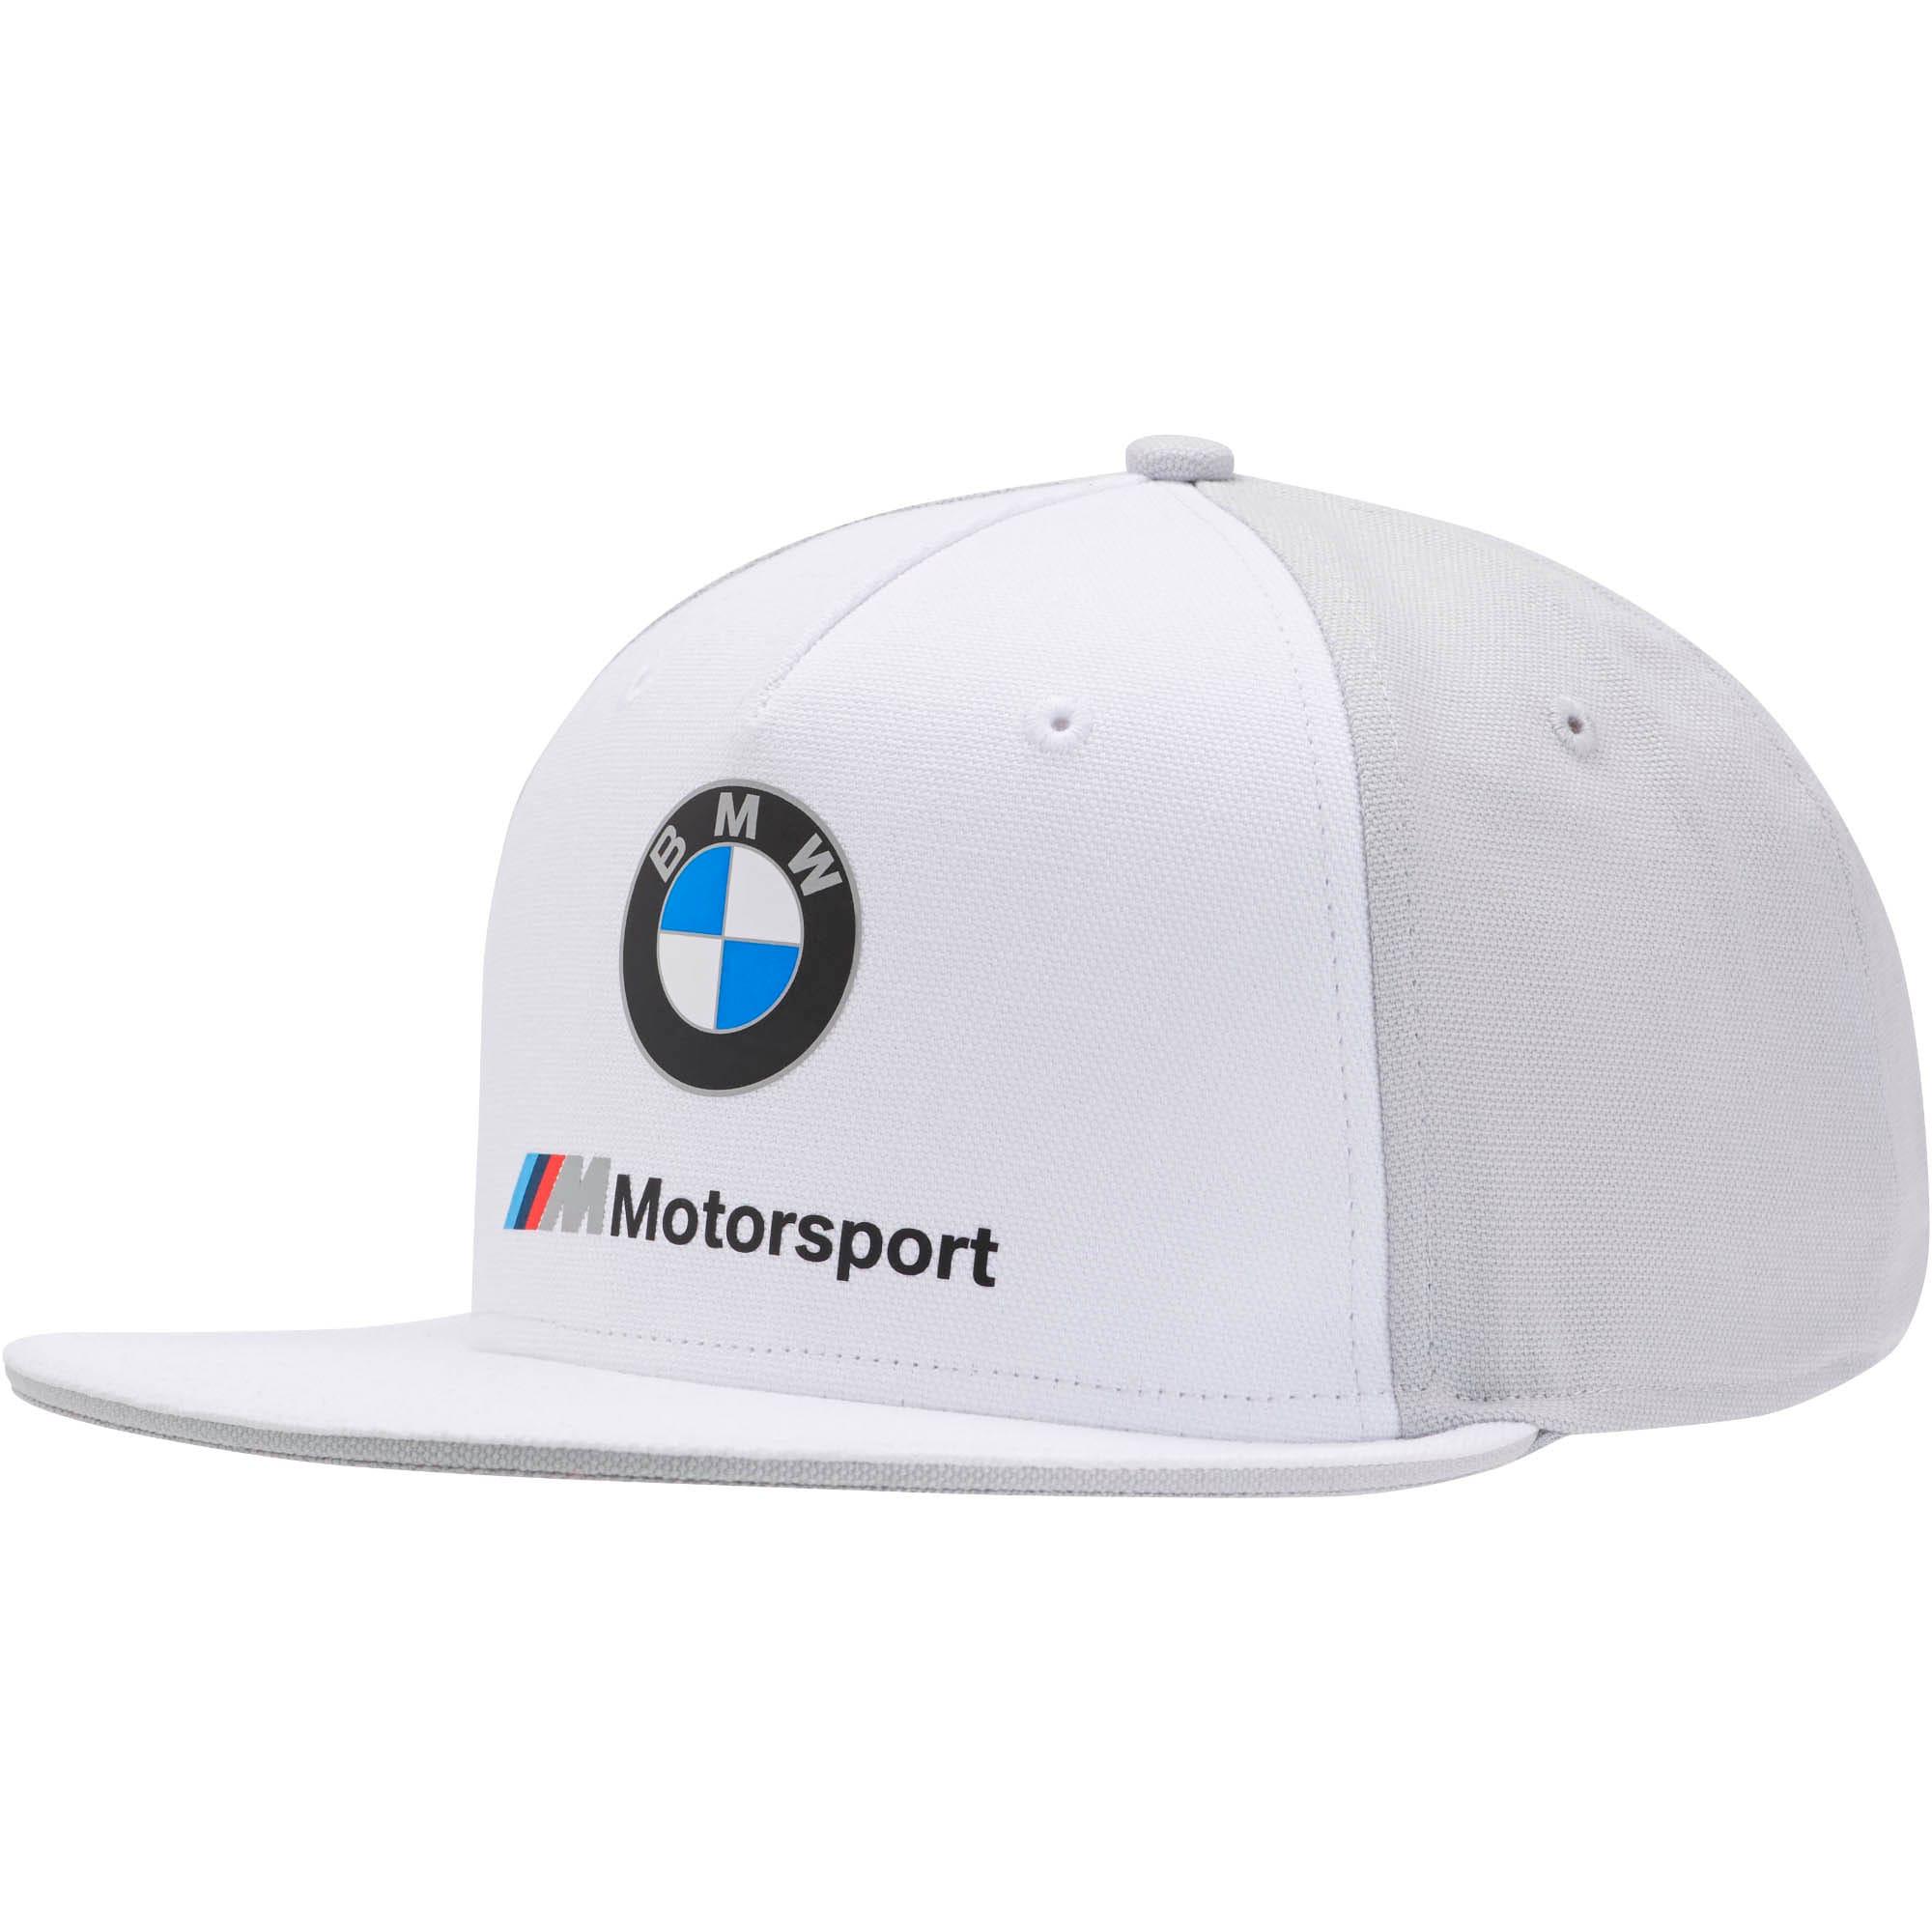 Thumbnail 1 of BMW M モータースポーツ FB キャップ, Puma White, medium-JPN